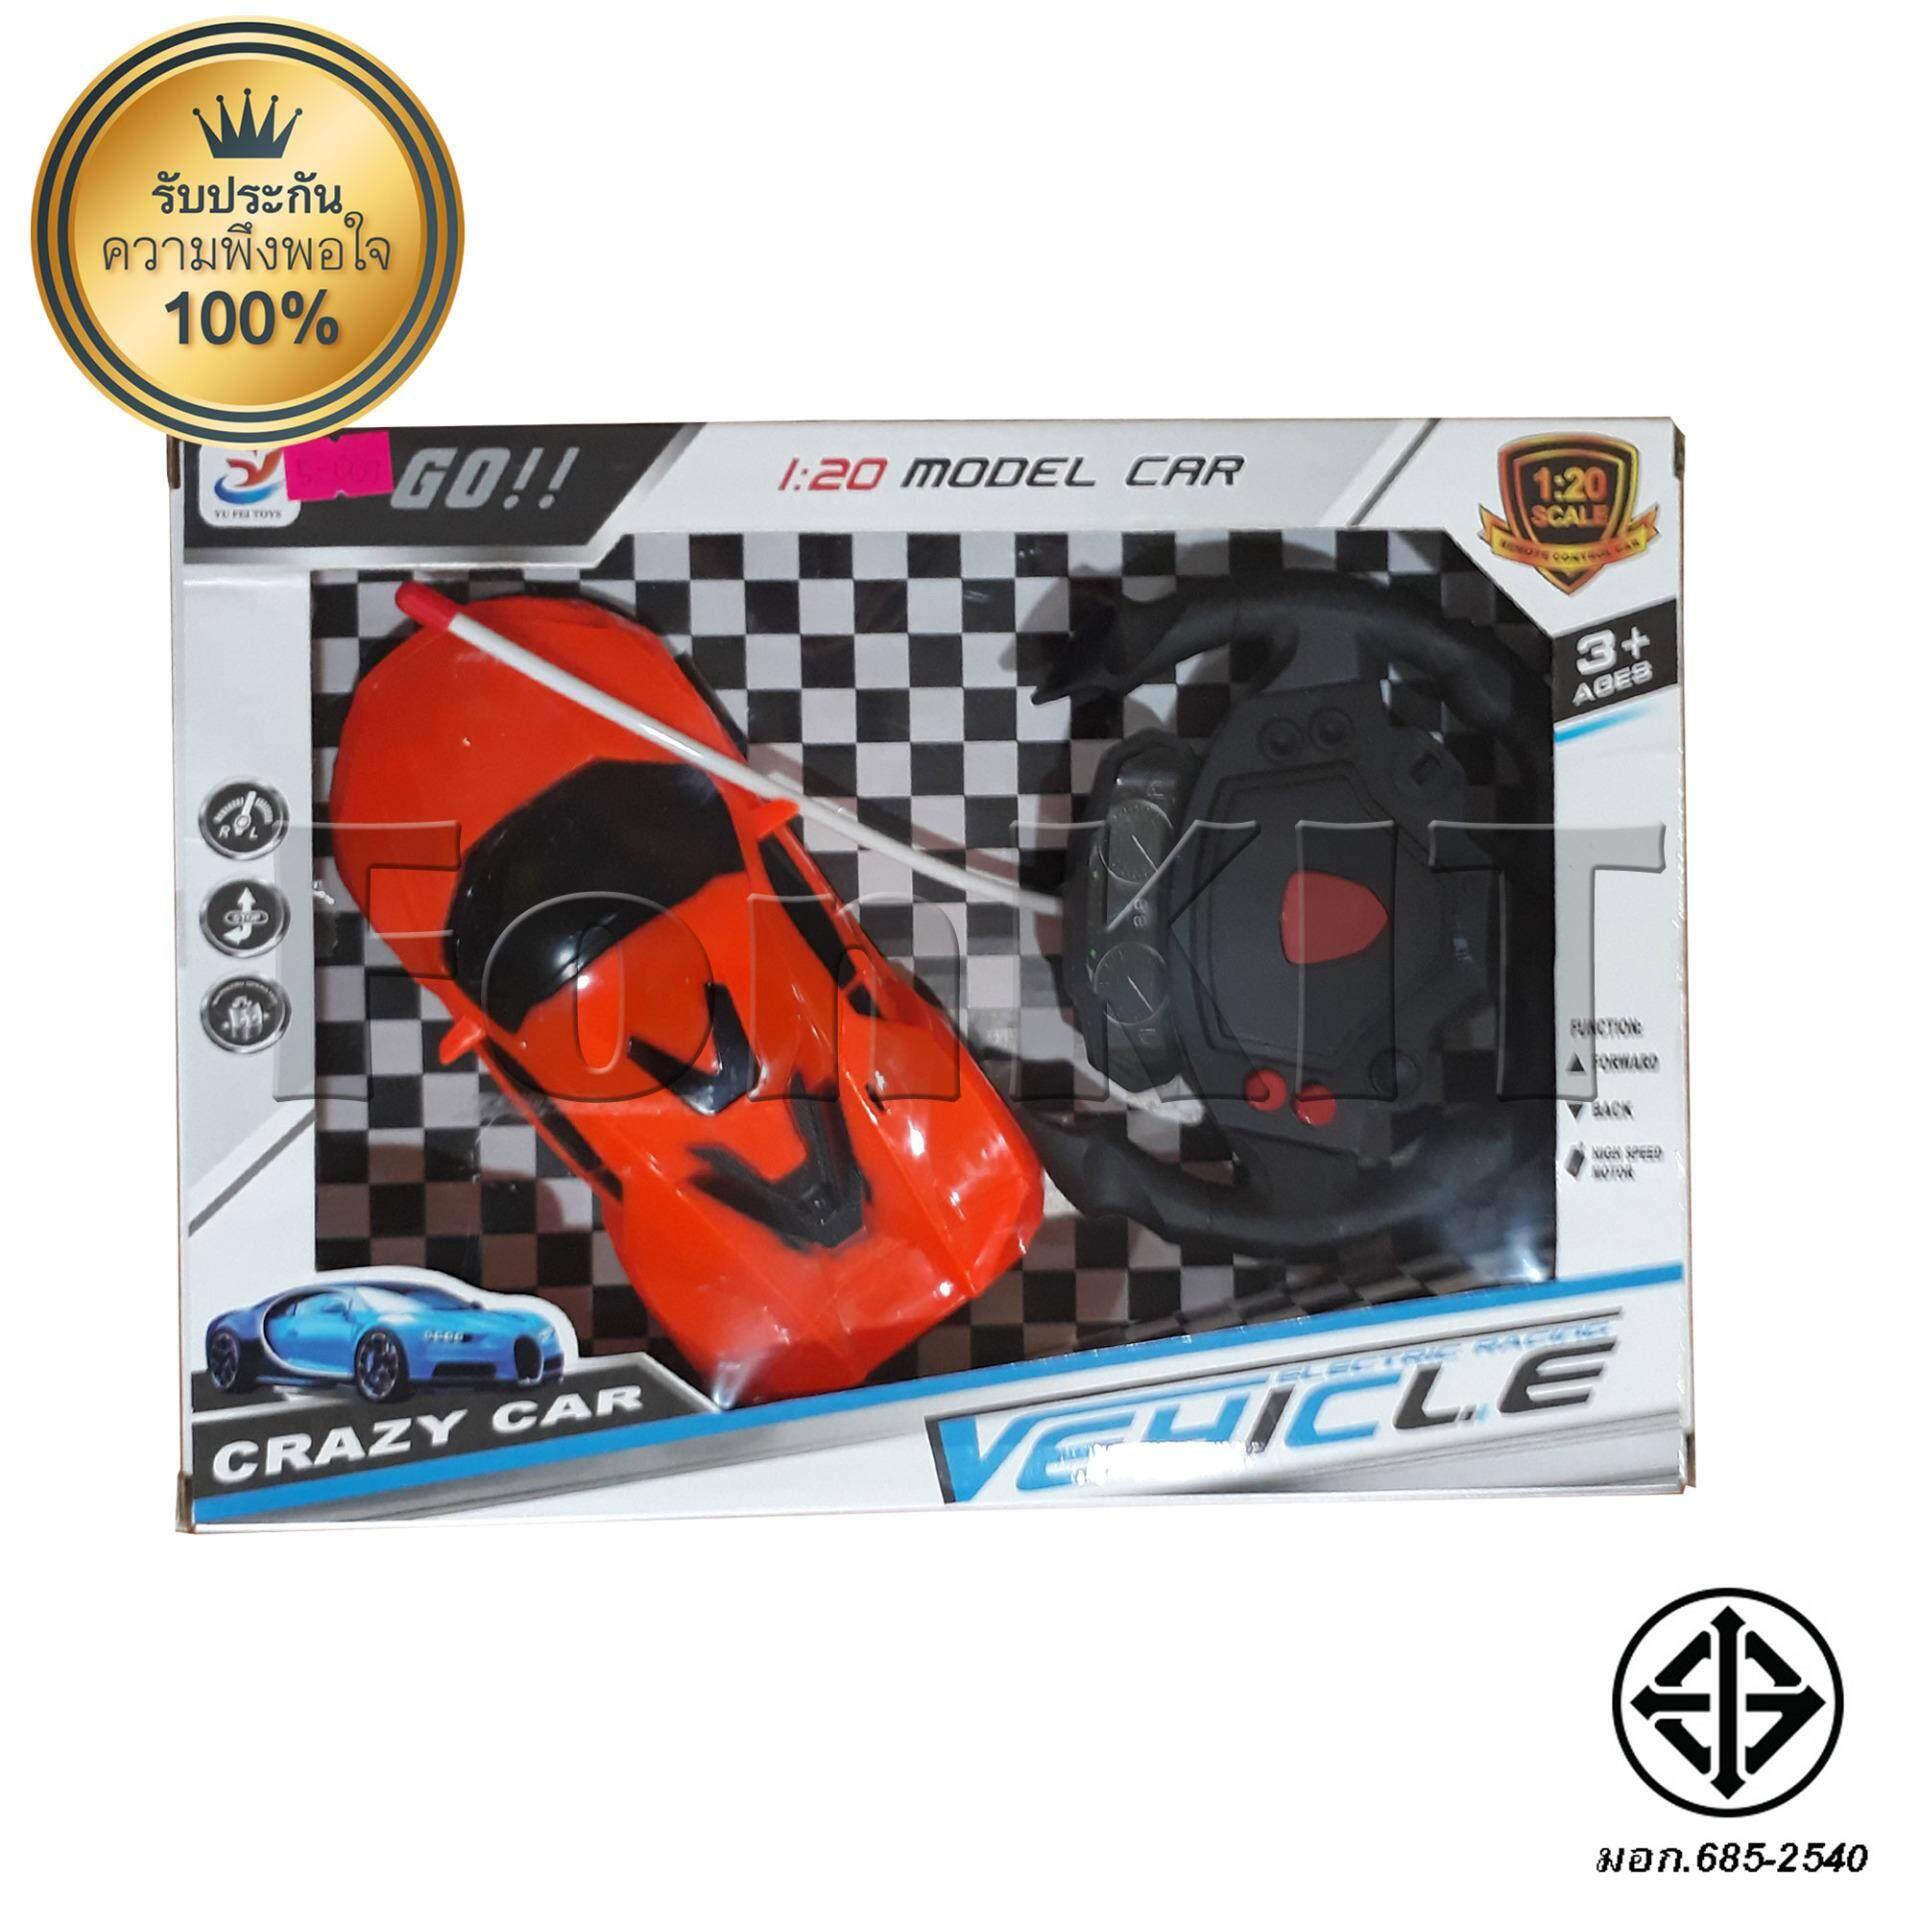 Toys 5007o รถสปอร์ต บังคับ สีส้ม Crazy Car มี รีโมทคอนโทรล วัสดุปลอดภัย มี มอก. ของเล่น Venicle Electric Racing สร้างเสริมจินตนาการ The Best Gifts For Children Funny Toy Knead Your Interesting Childhood Its A Magical World Lets Play Together By Fonkit.